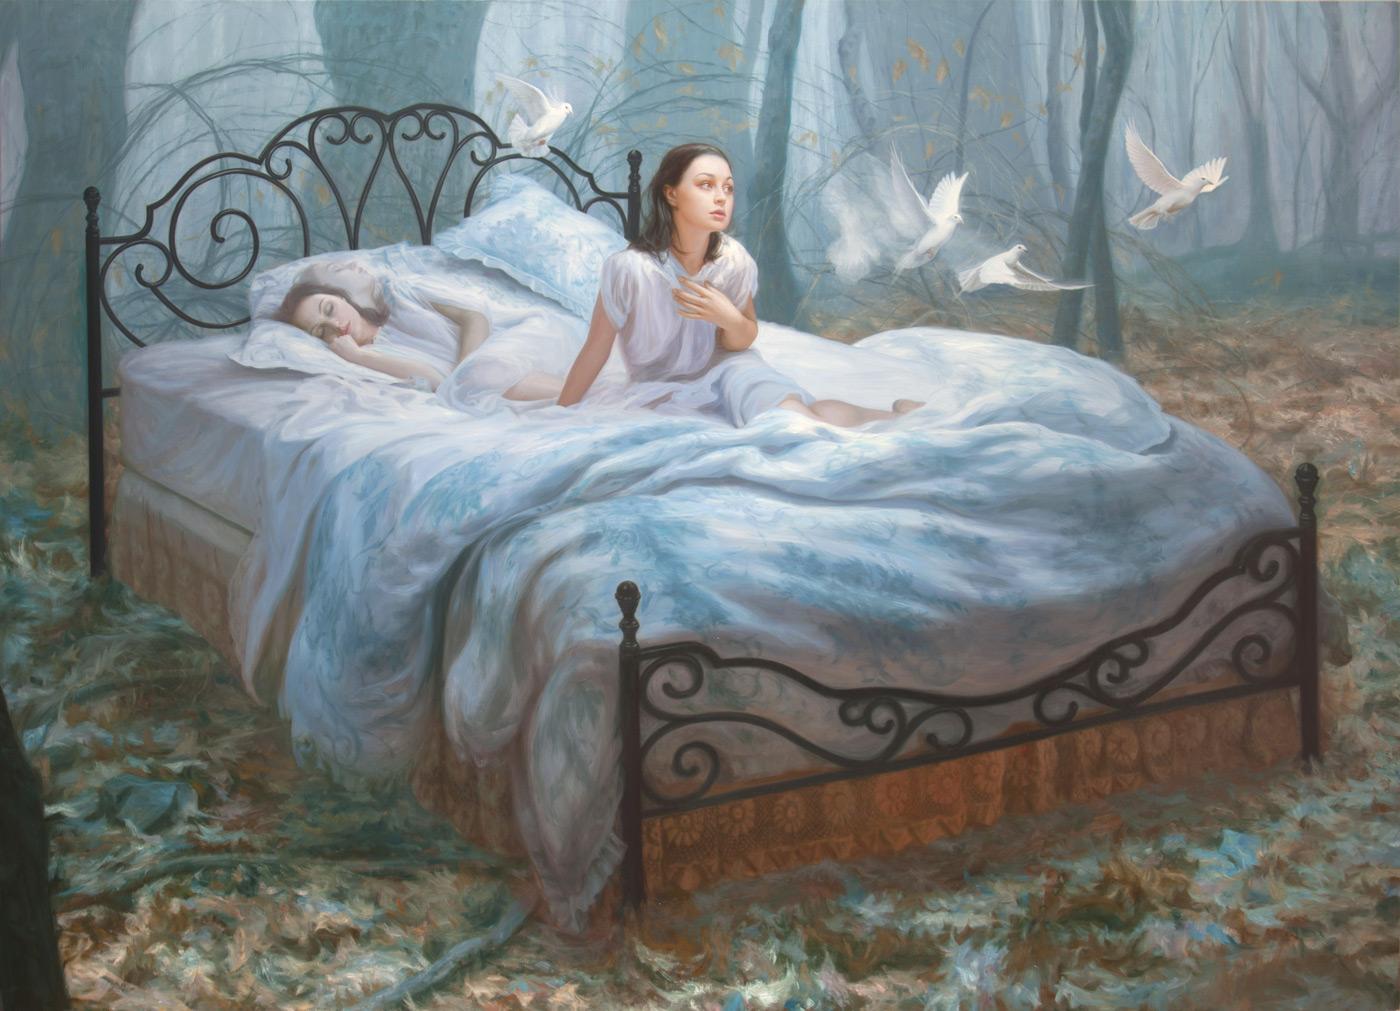 Awakening ©Dorian Vallejo